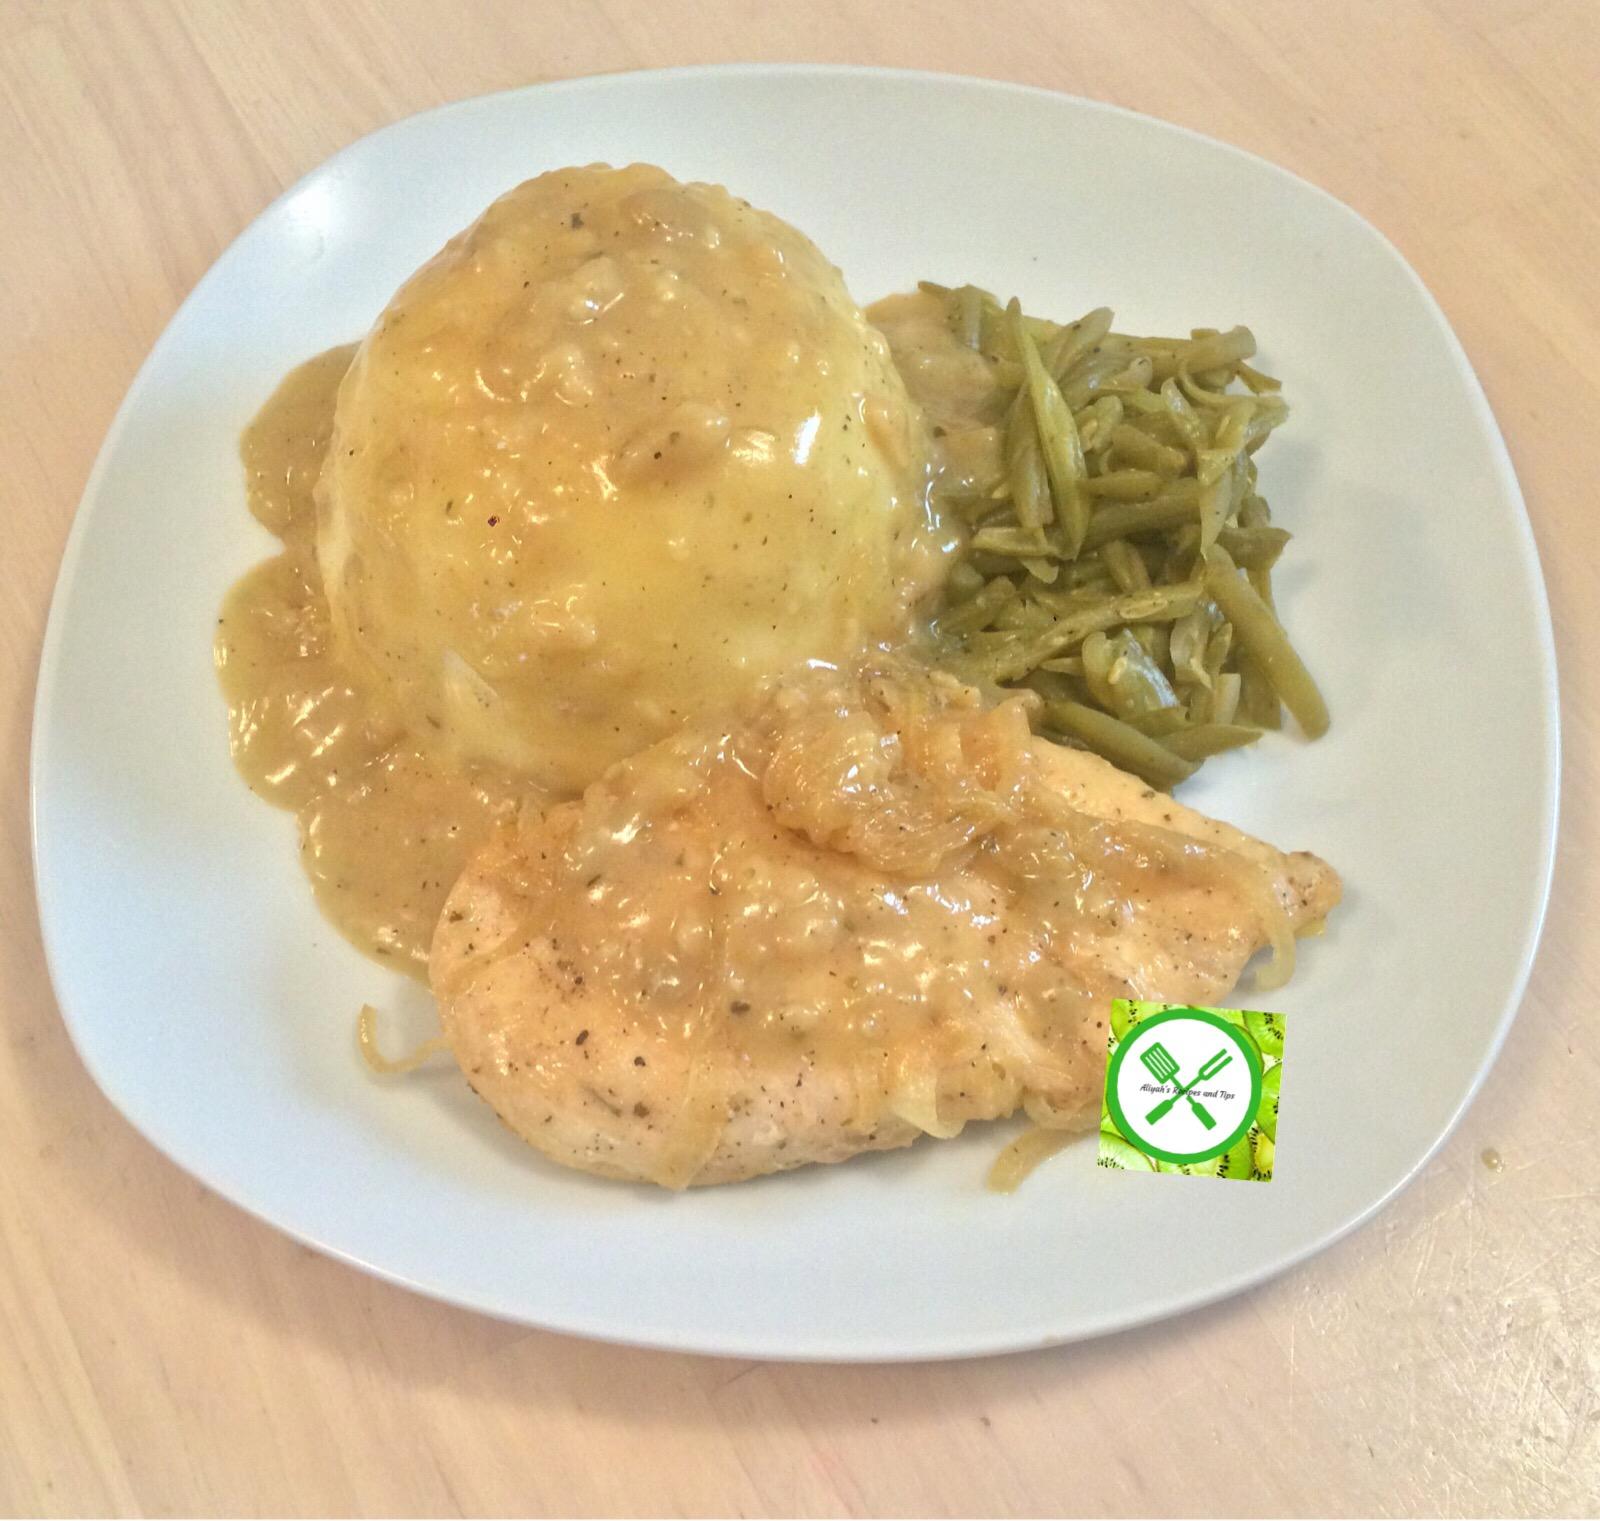 mashed potatoes served